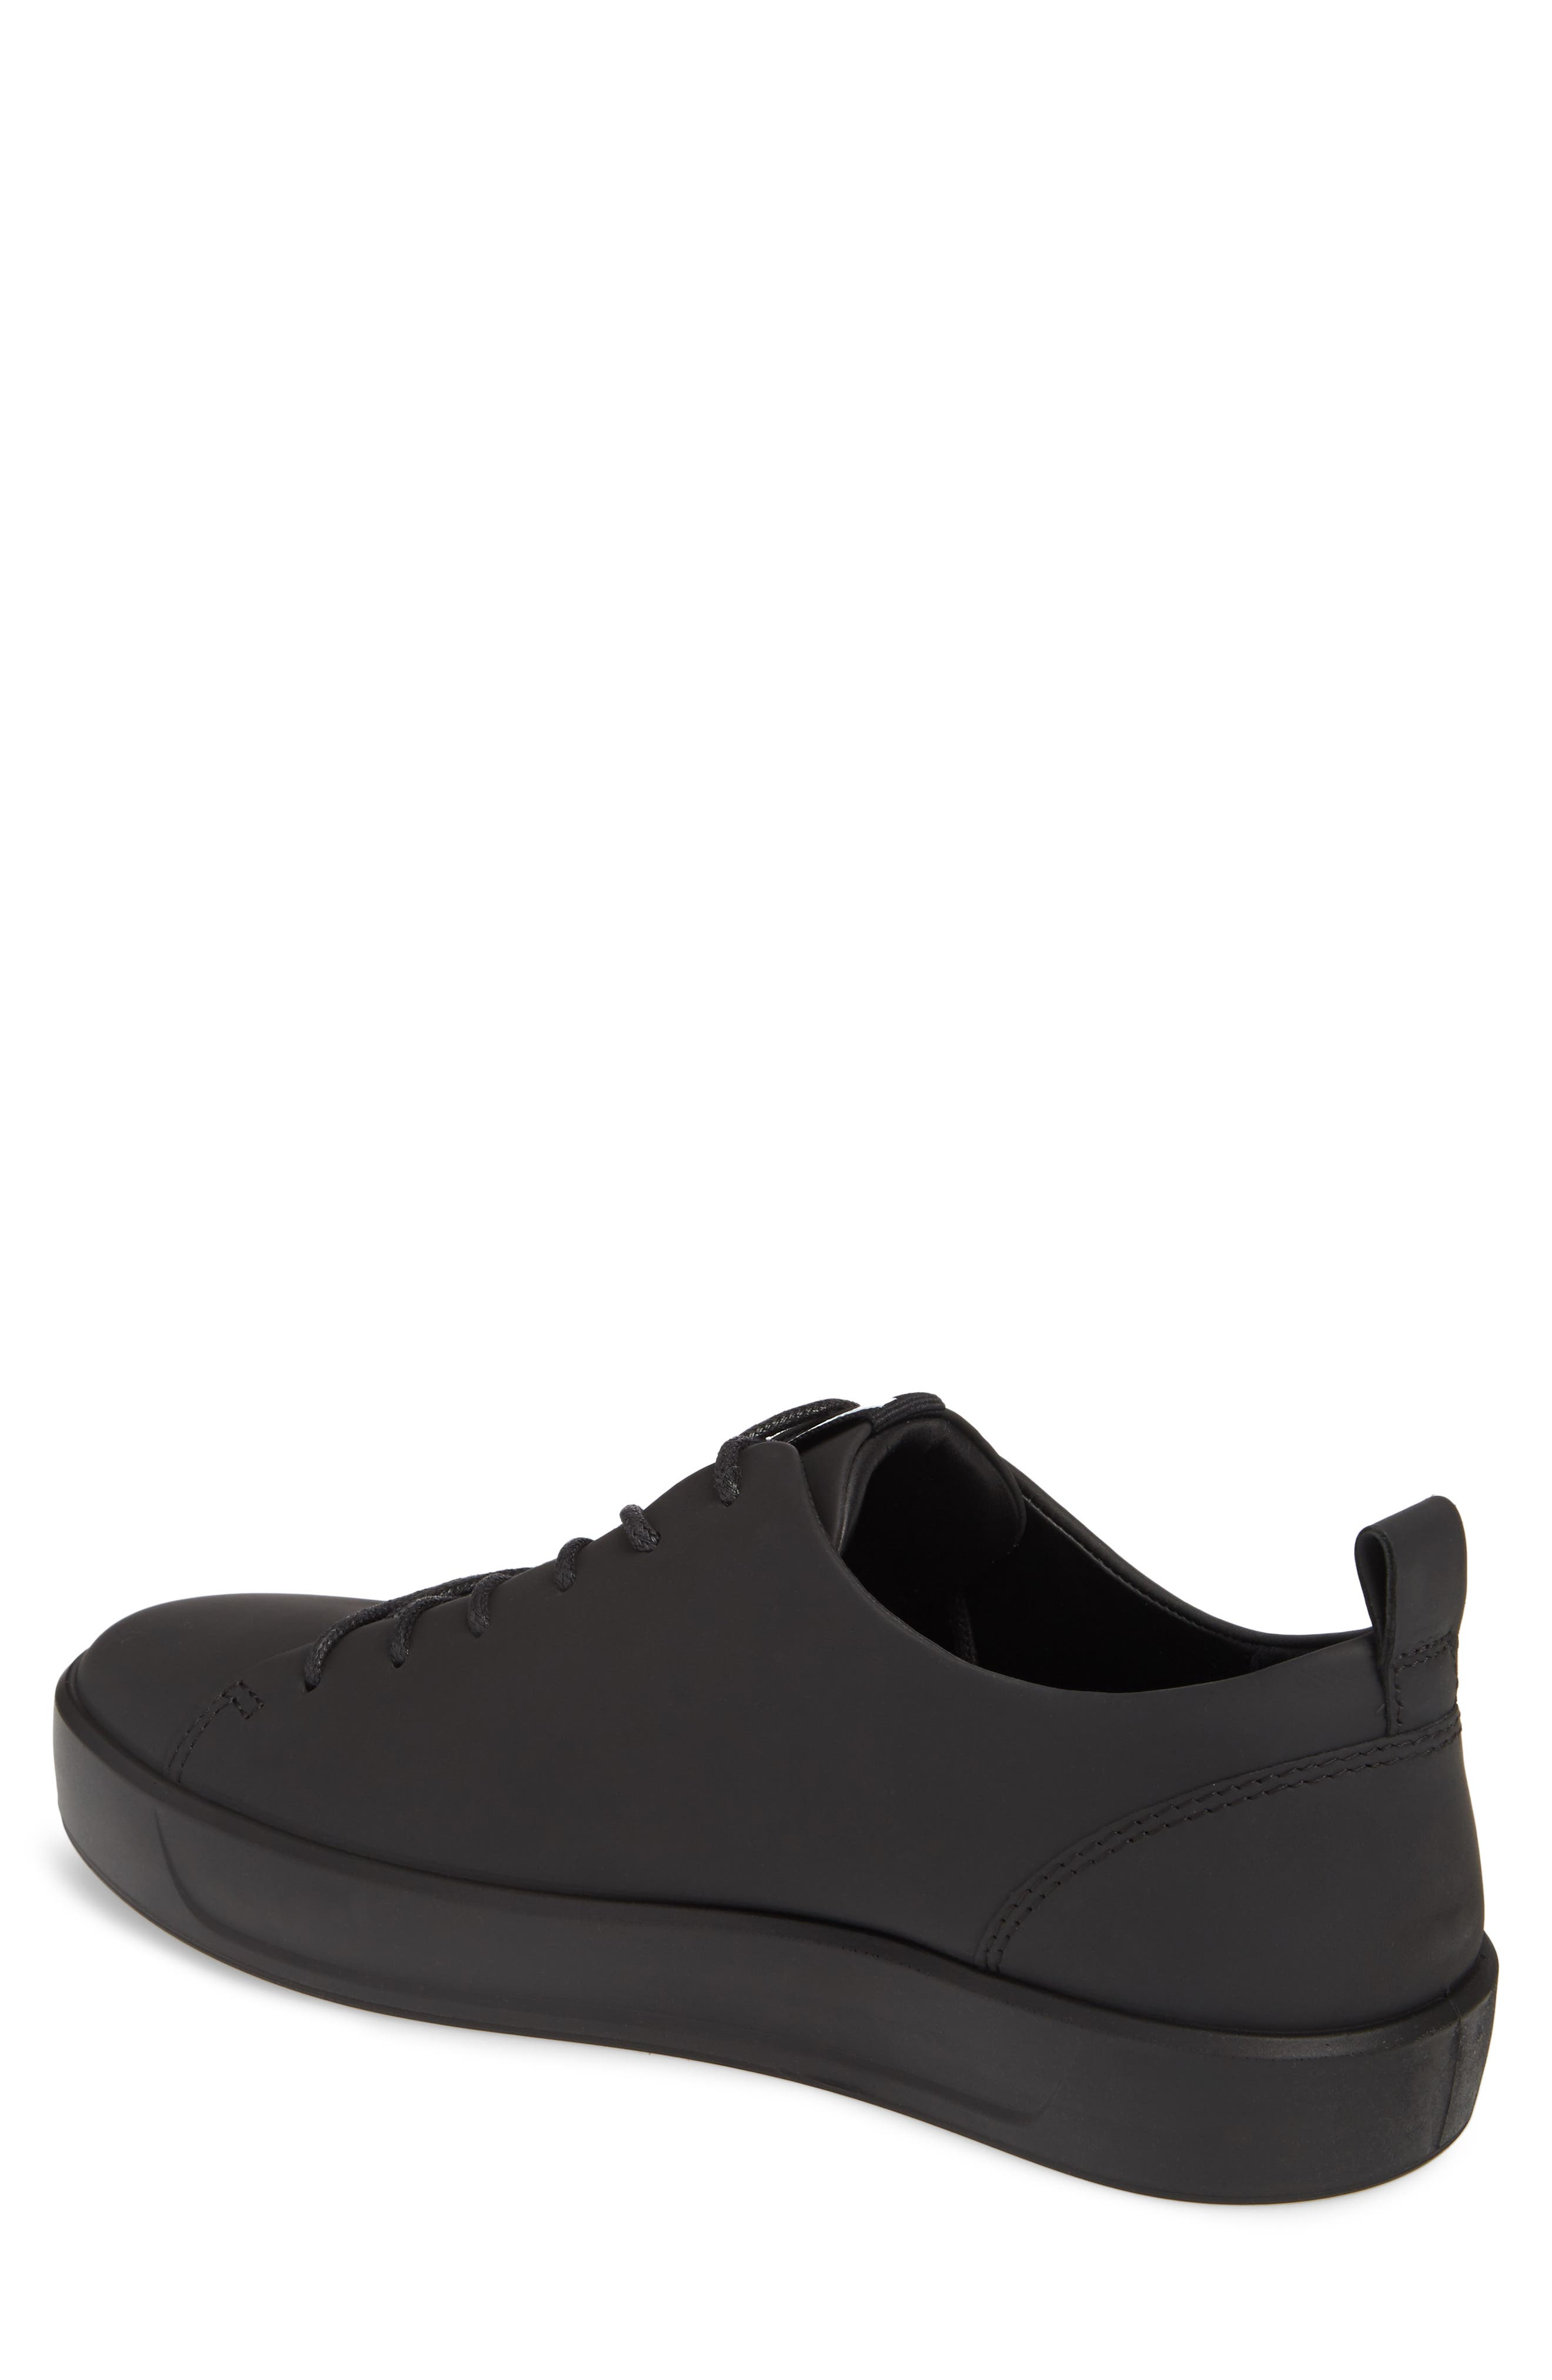 Soft 8 Sneaker,                             Alternate thumbnail 2, color,                             BLACK LEATHER